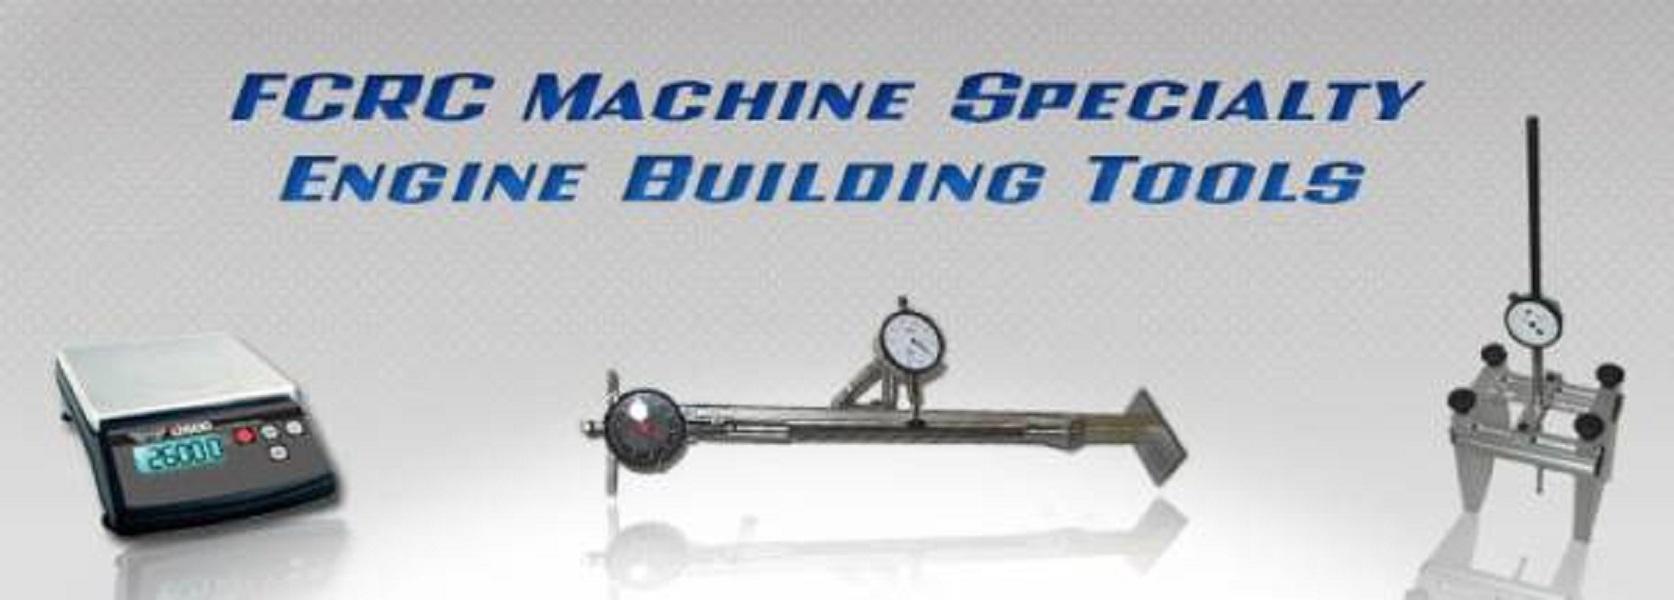 fcrc machine